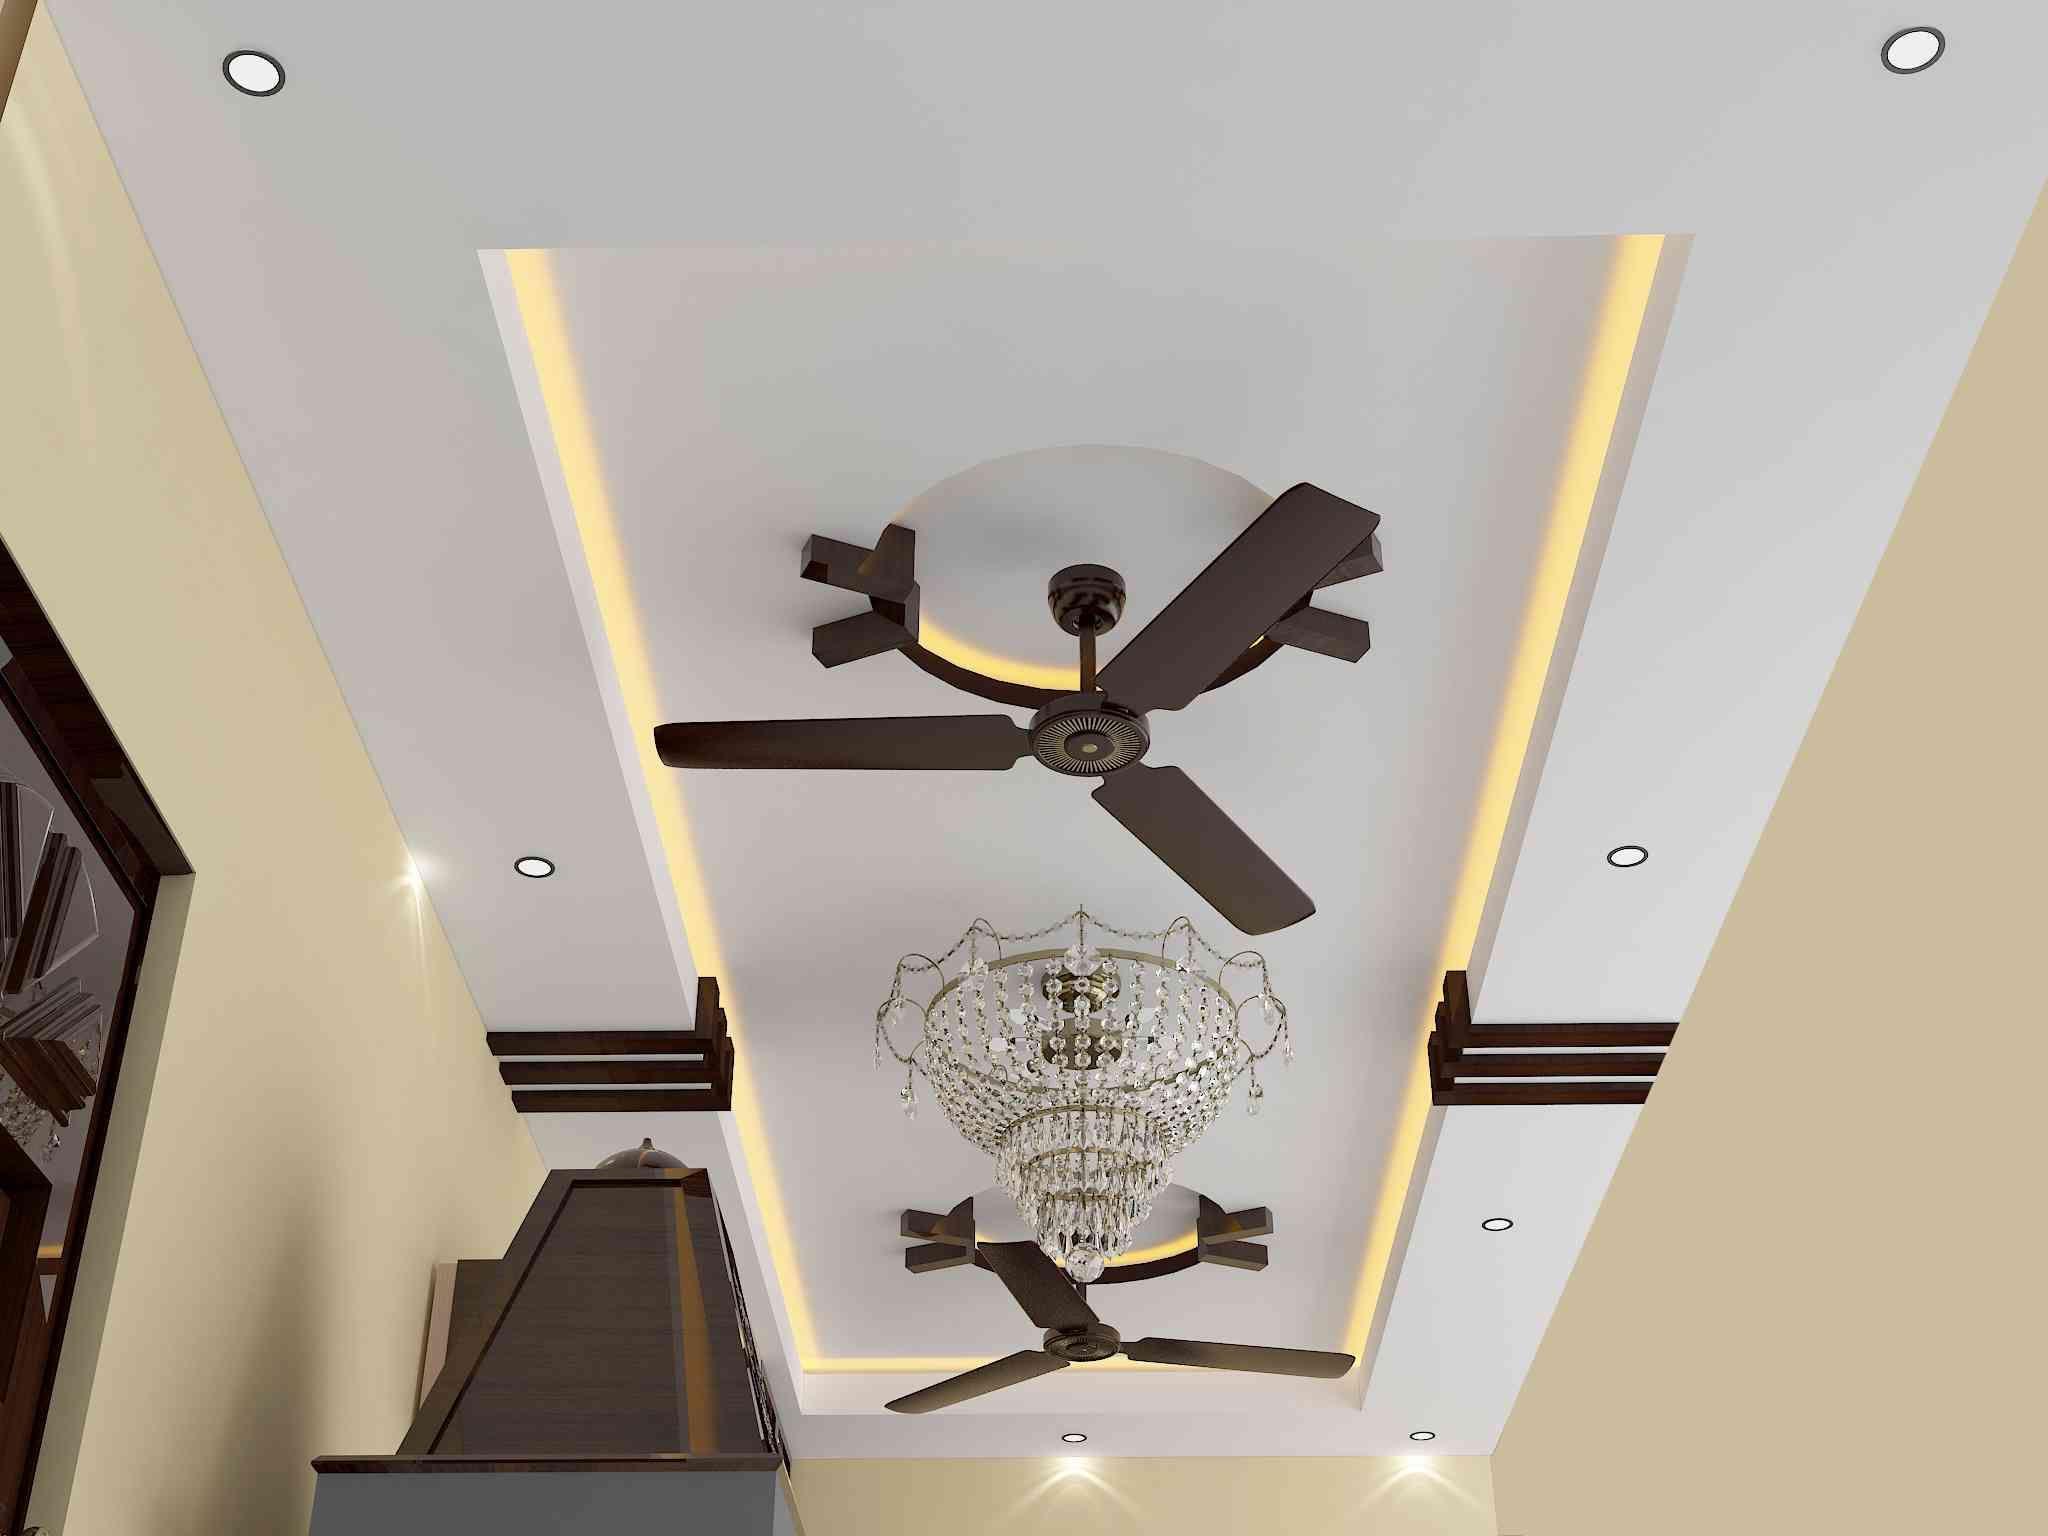 Falseceiling Chennai Http Blueinteriordesigns Com False Ceiling Chennai Html F Pop False Ceiling Design Ceiling Design Modern Simple False Ceiling Design